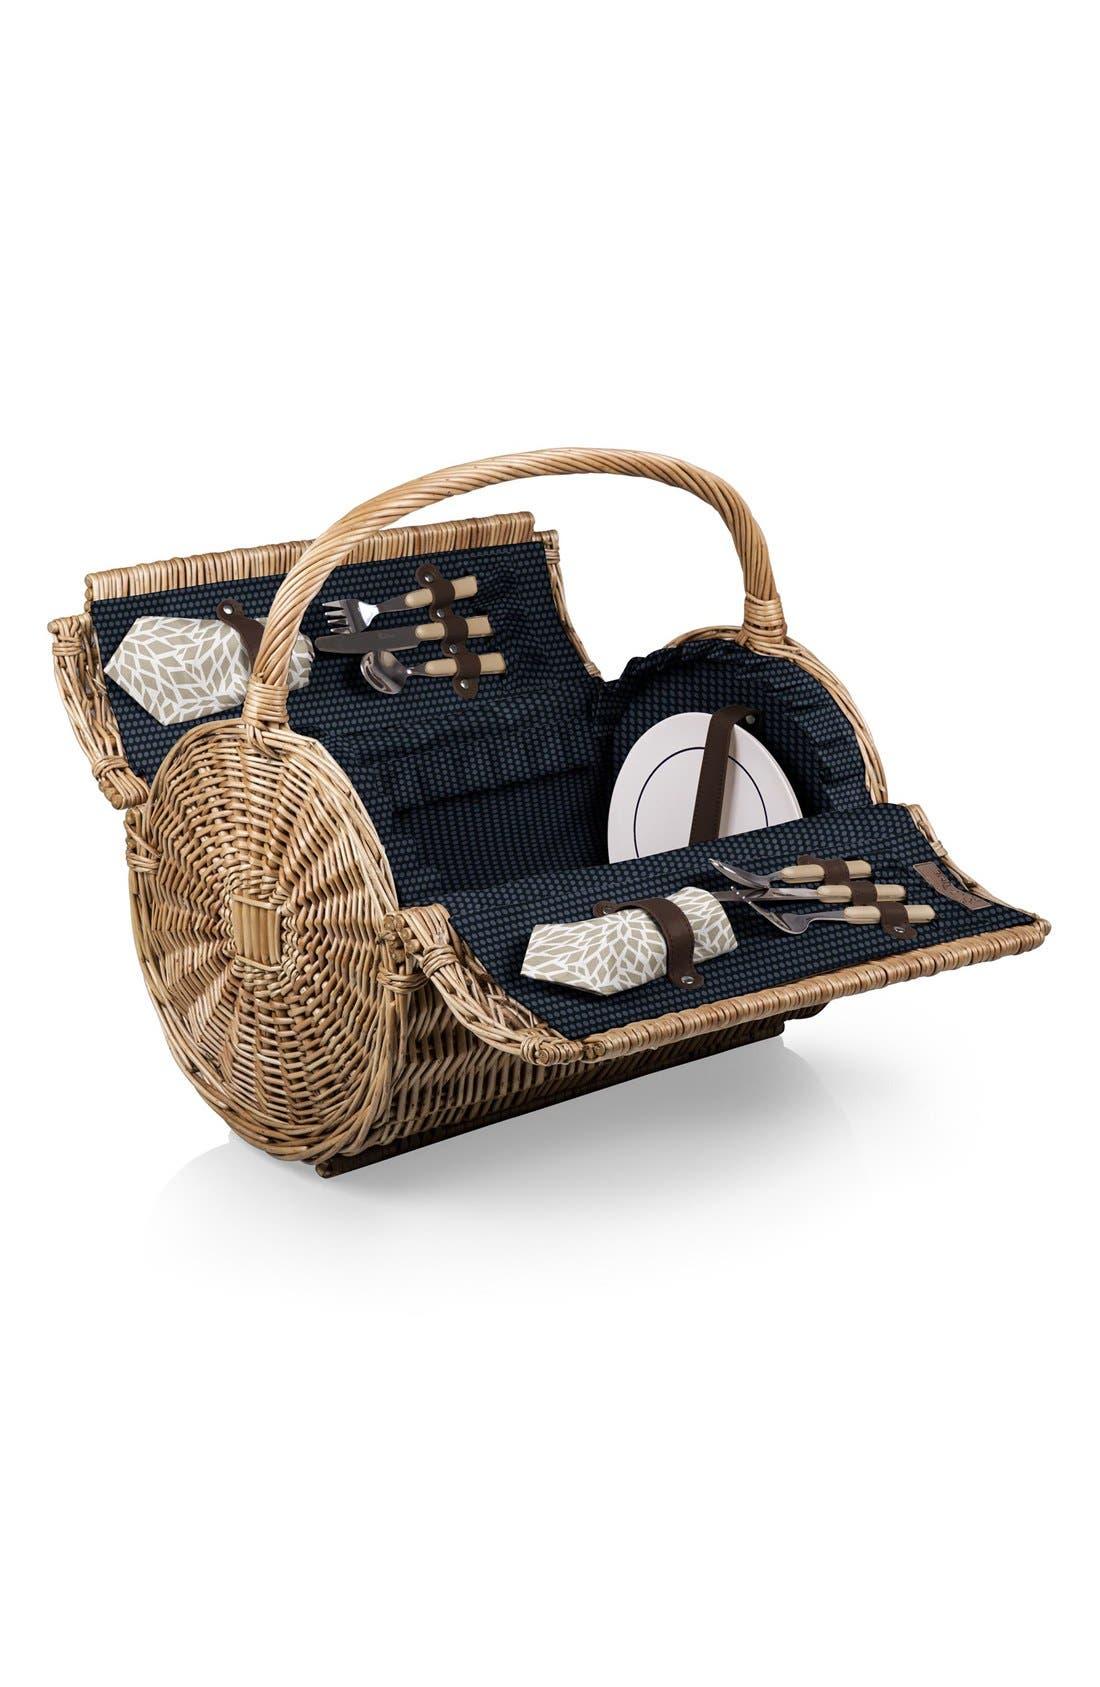 Alternate Image 1 Selected - Picnic Time Wicker Barrel Picnic Basket